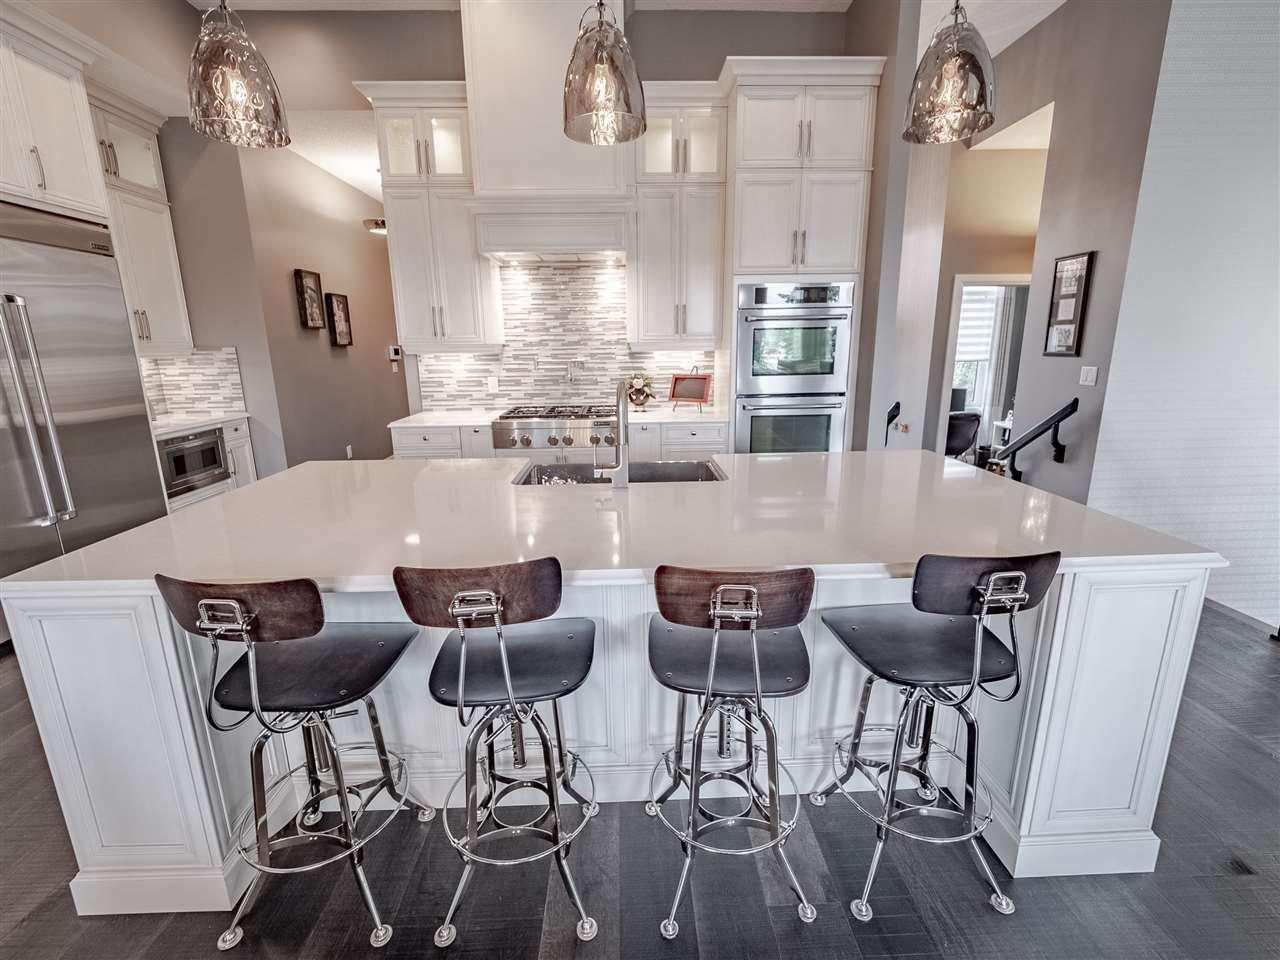 Photo 15: Photos: 58 Kenton Woods Lane NW: Spruce Grove House for sale : MLS®# E4166439